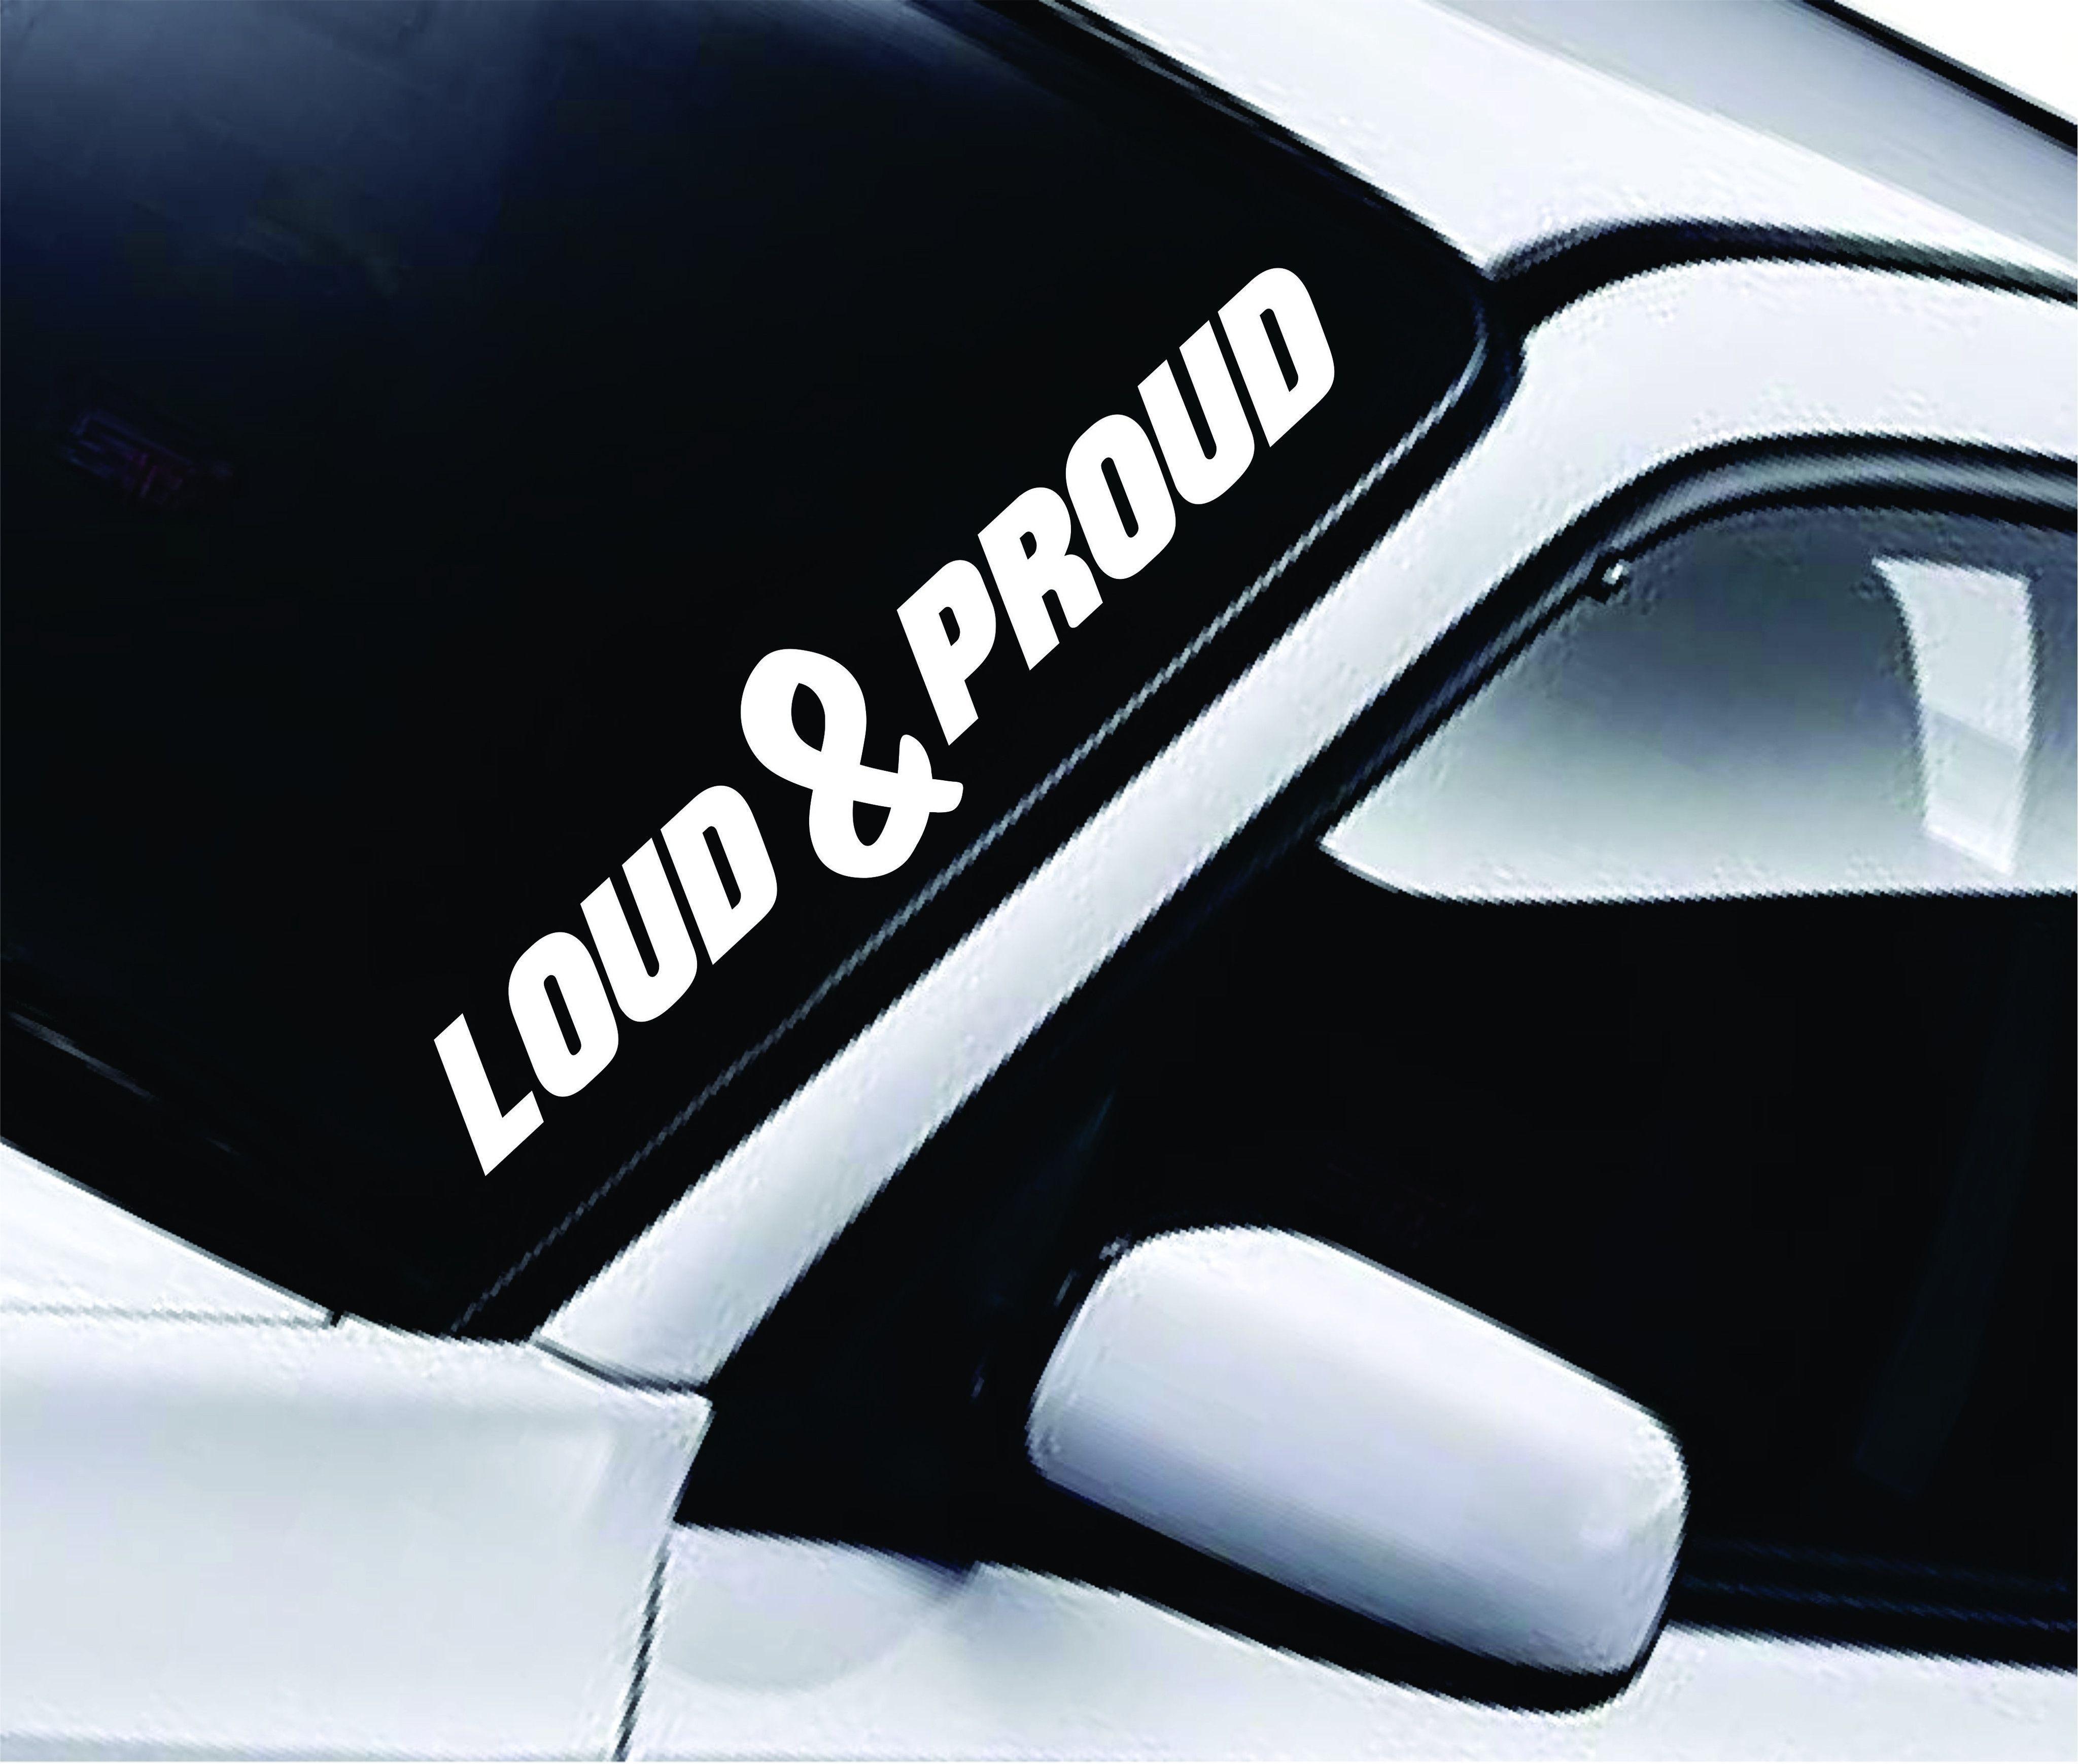 Loud And Proud Large Quote Design Sticker Vinyl Art Words Decor Car Truck Jdm Windshield Race Drift Window Word Decor Cool Car Stickers Decal Wall Art [ 3477 x 4096 Pixel ]